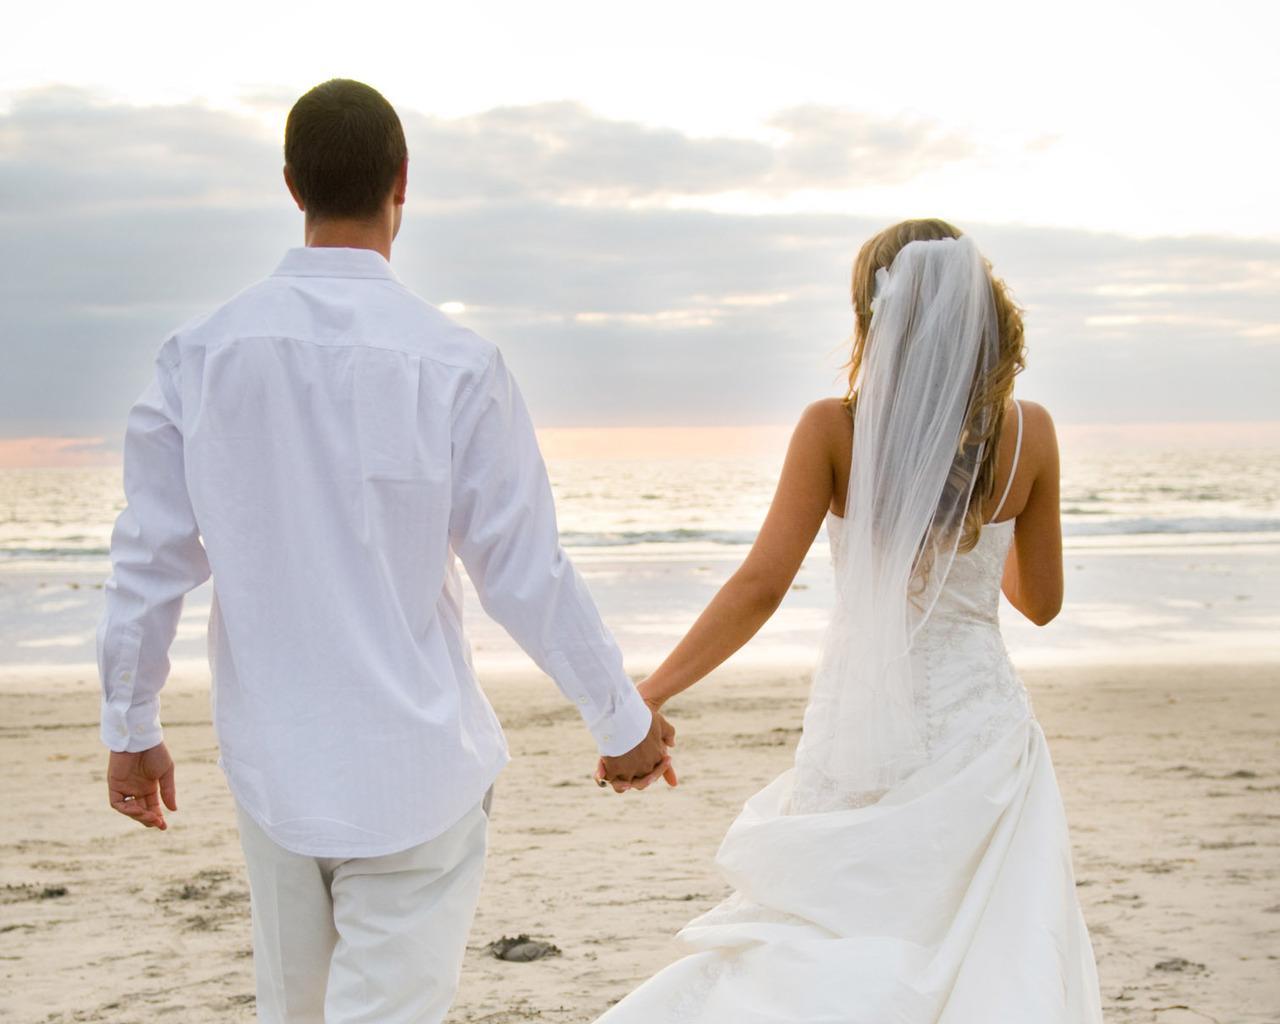 Свадьба нарисованная